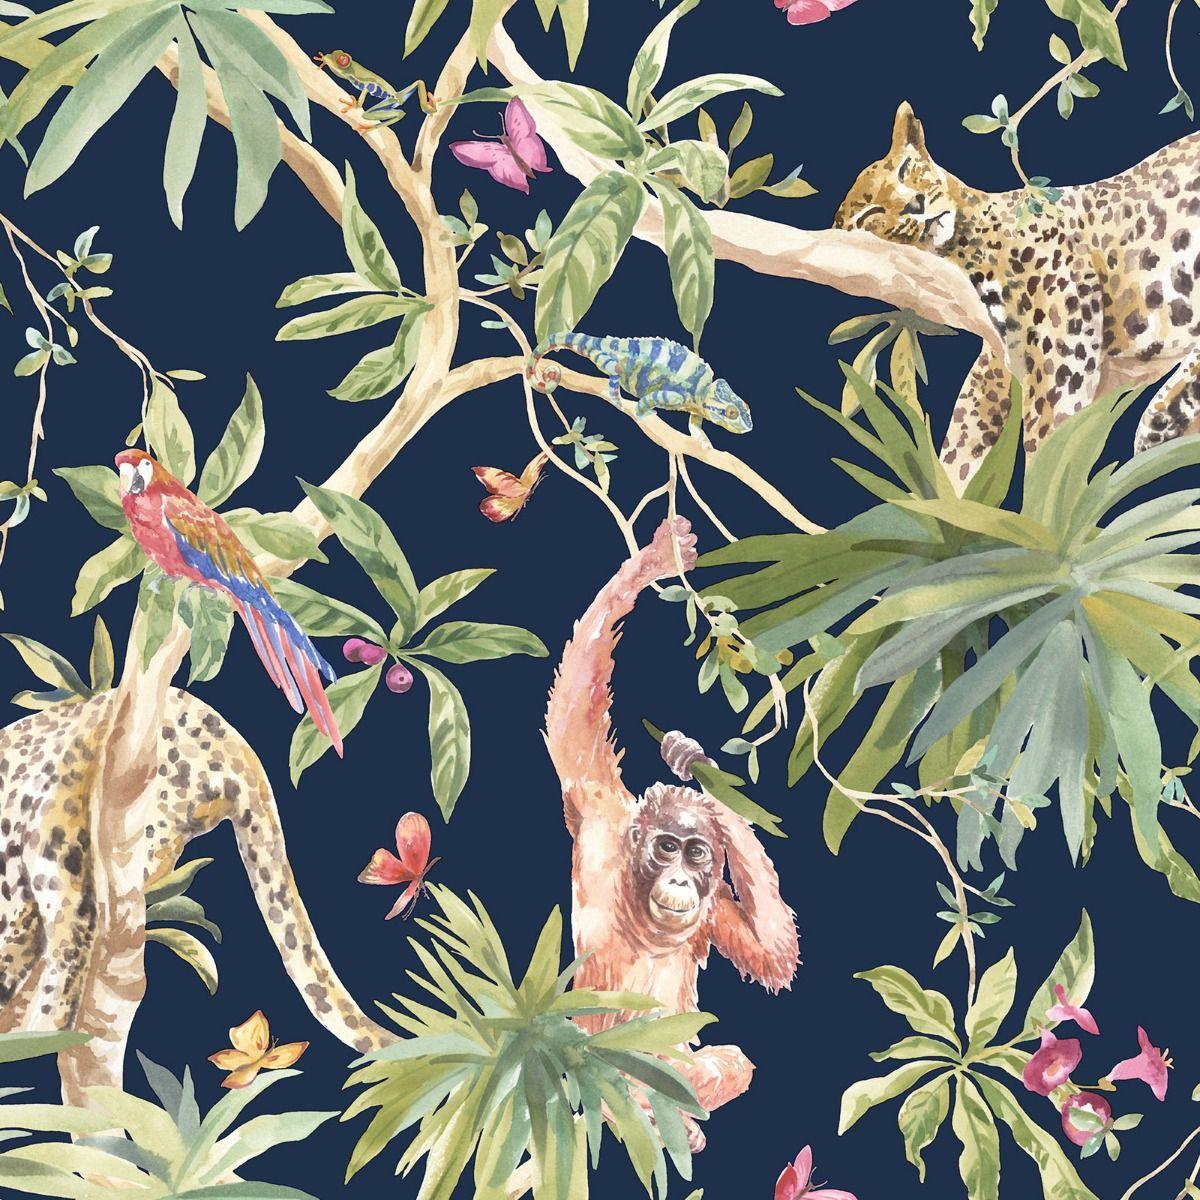 2020 colour of the year classic blue jungle lemur wallpaper